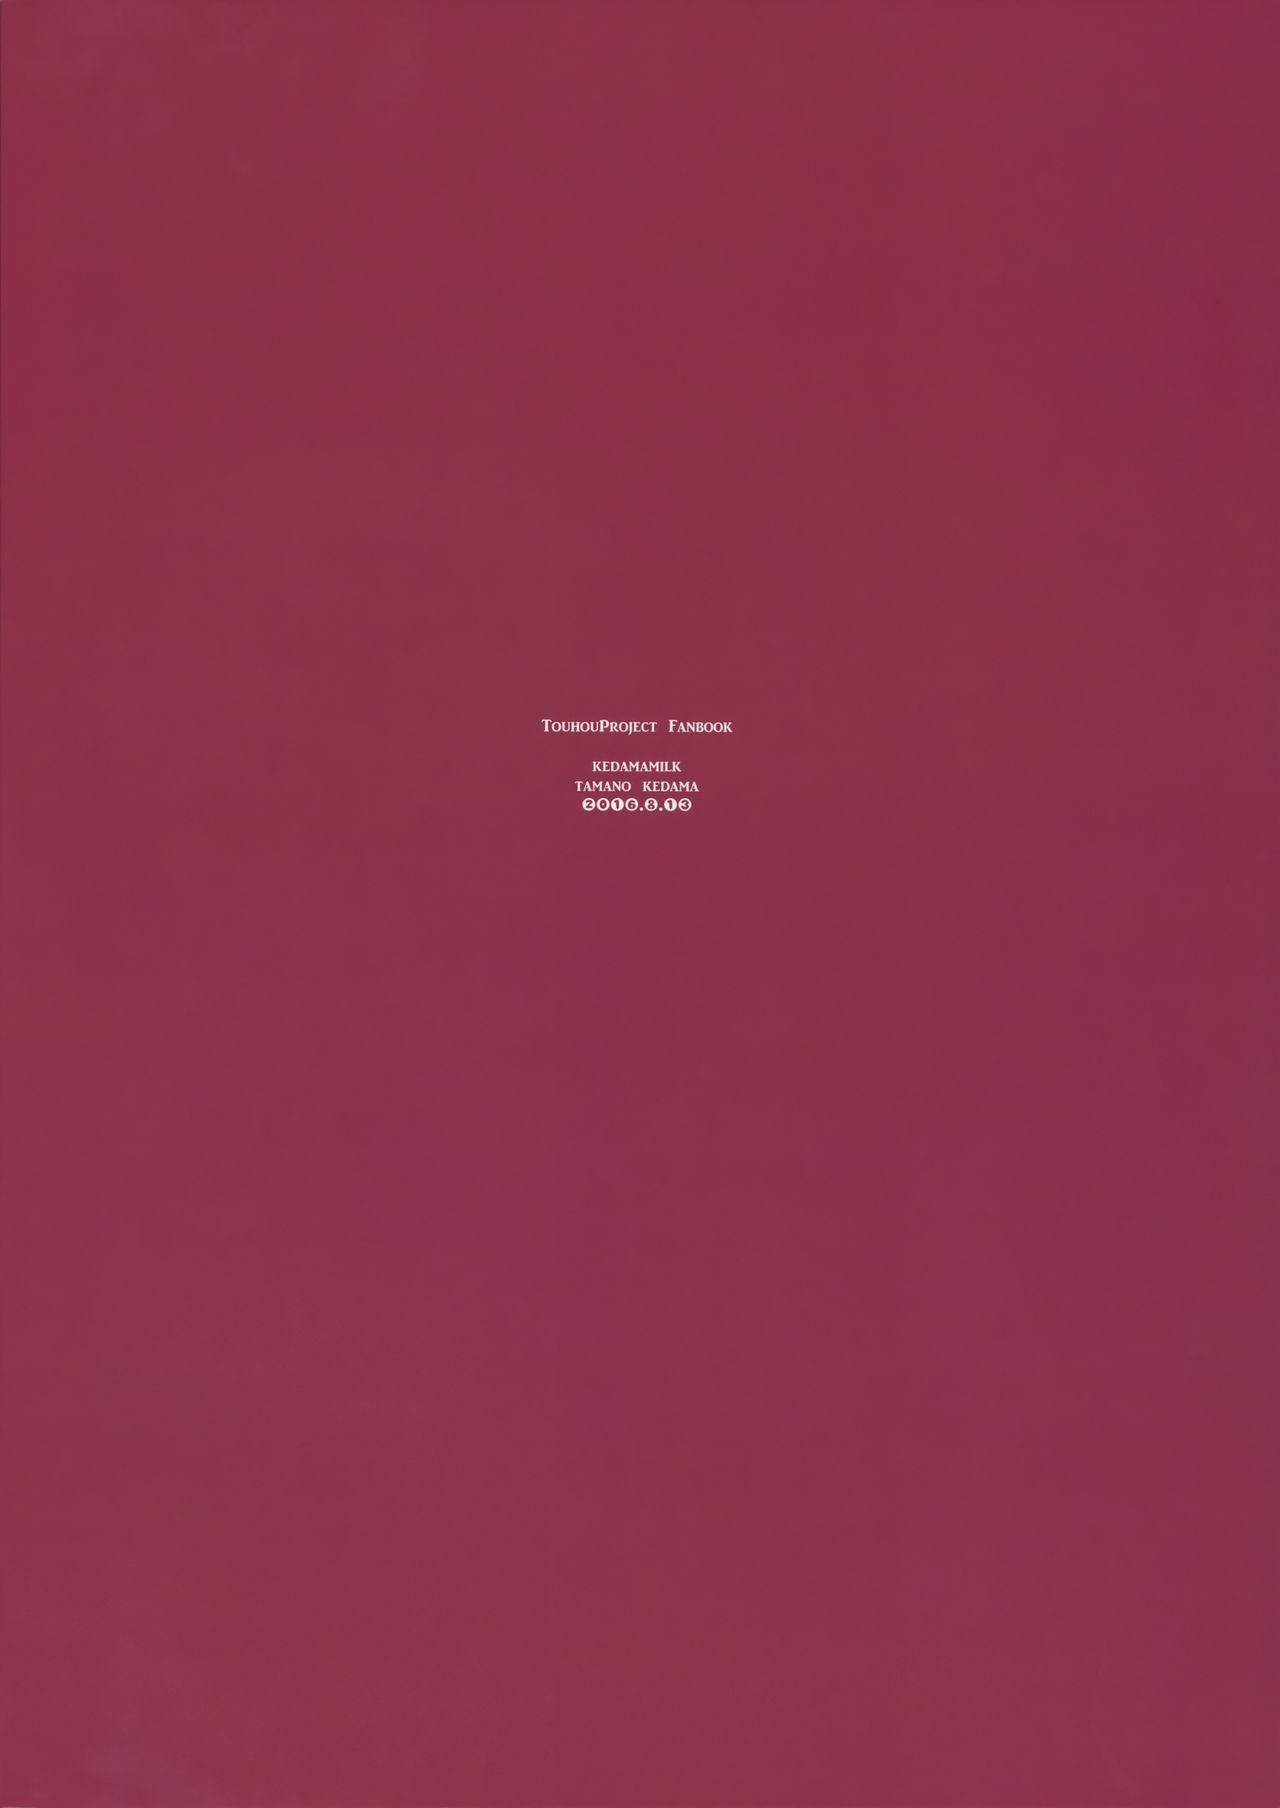 (C90) [Kedama Gyuunyuu (Tamano Kedama)] Karakuchi Patchouli-sama | Scathing Patchouli-sama (Touhou Project) [English] [Danicco] 25